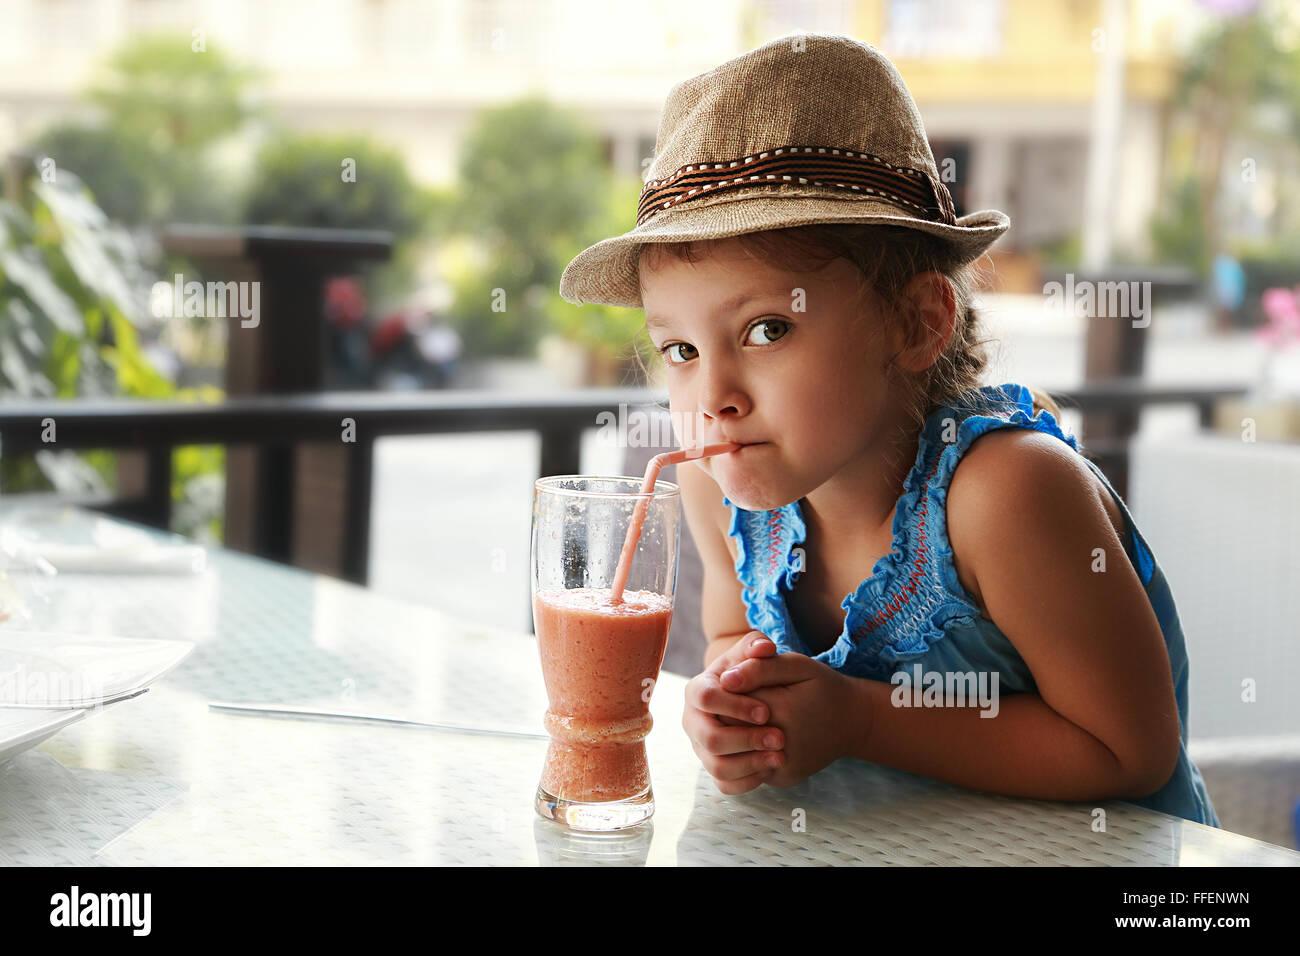 Relations sérieuses in cute kid curieux girl drinking jus savoureux en été street cafe Photo Stock